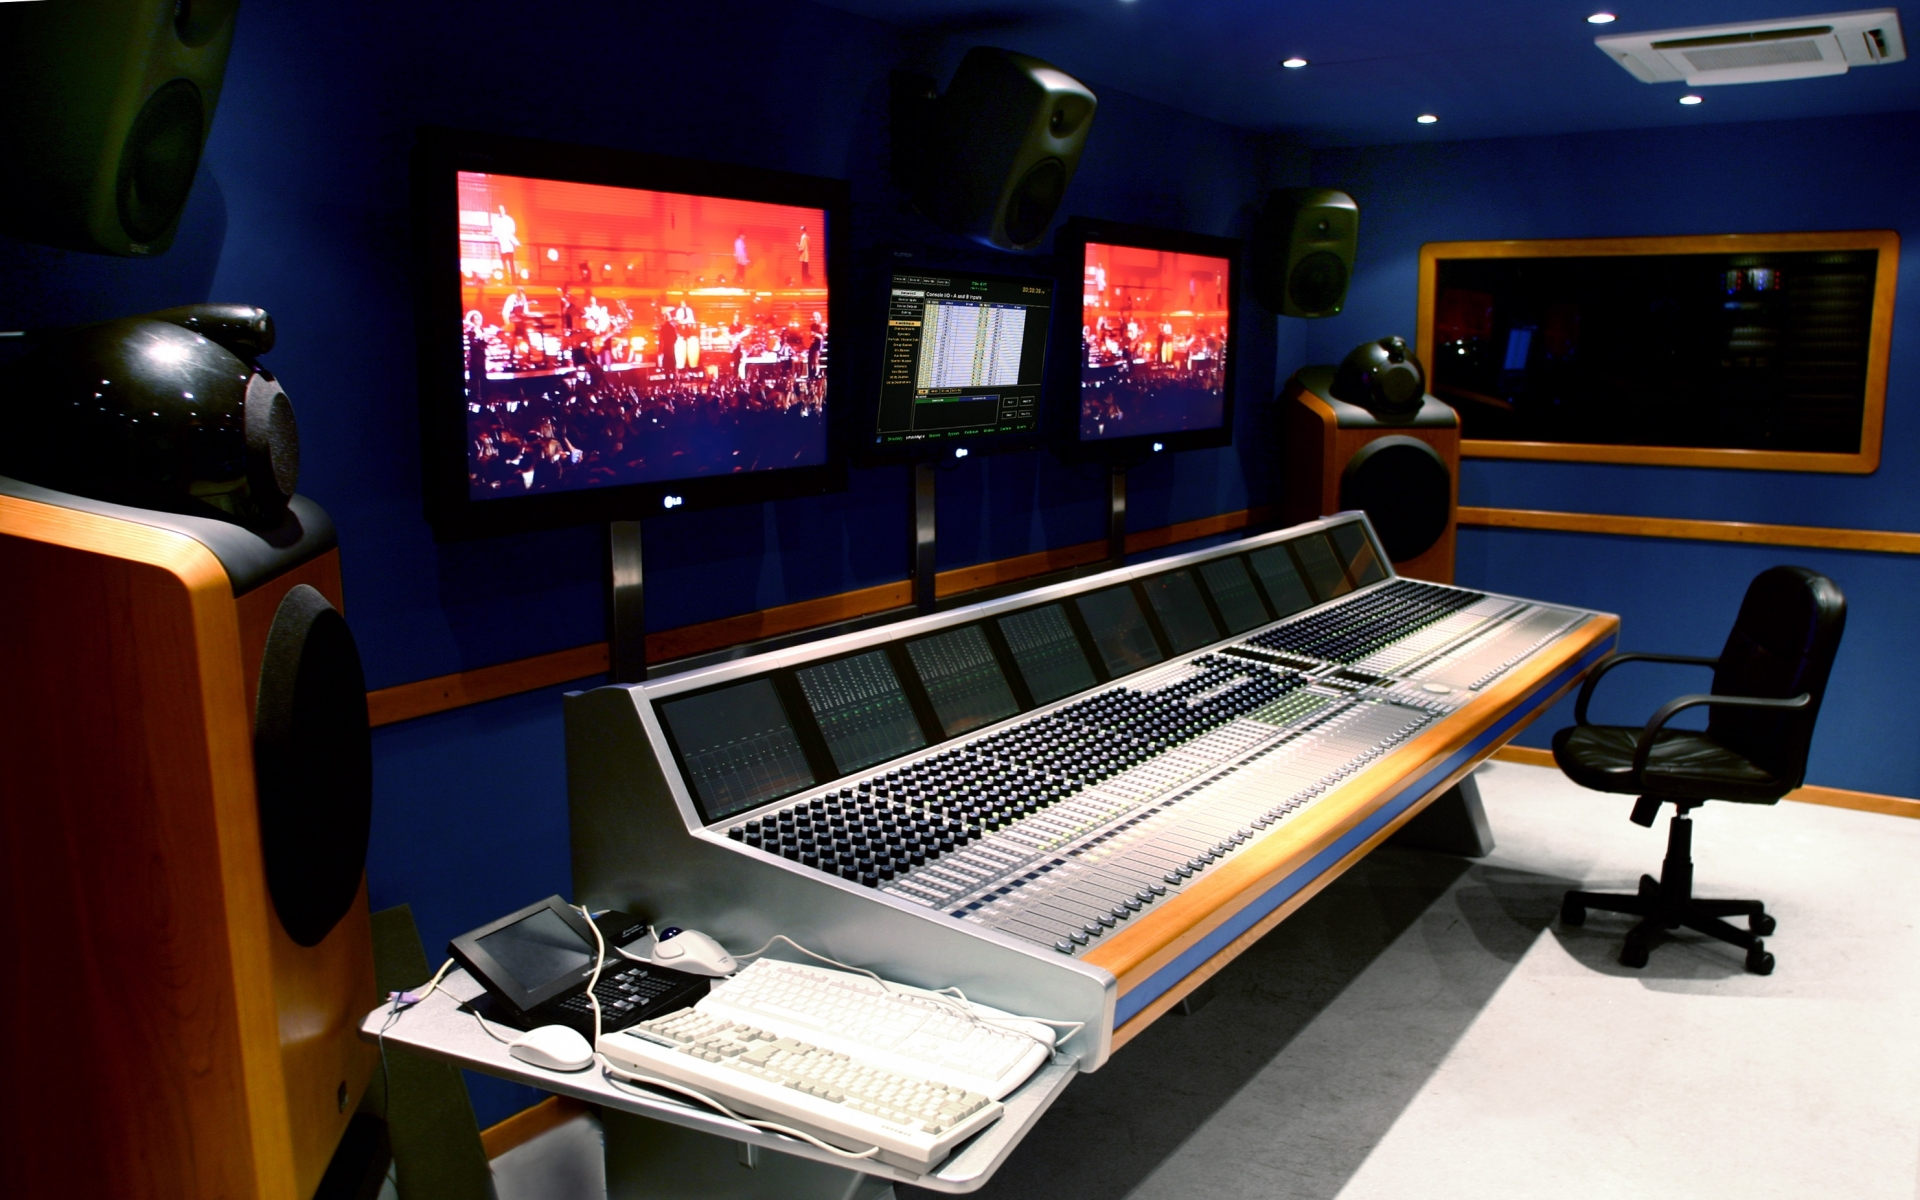 Music studio wallpaper   Imagui 1920x1200